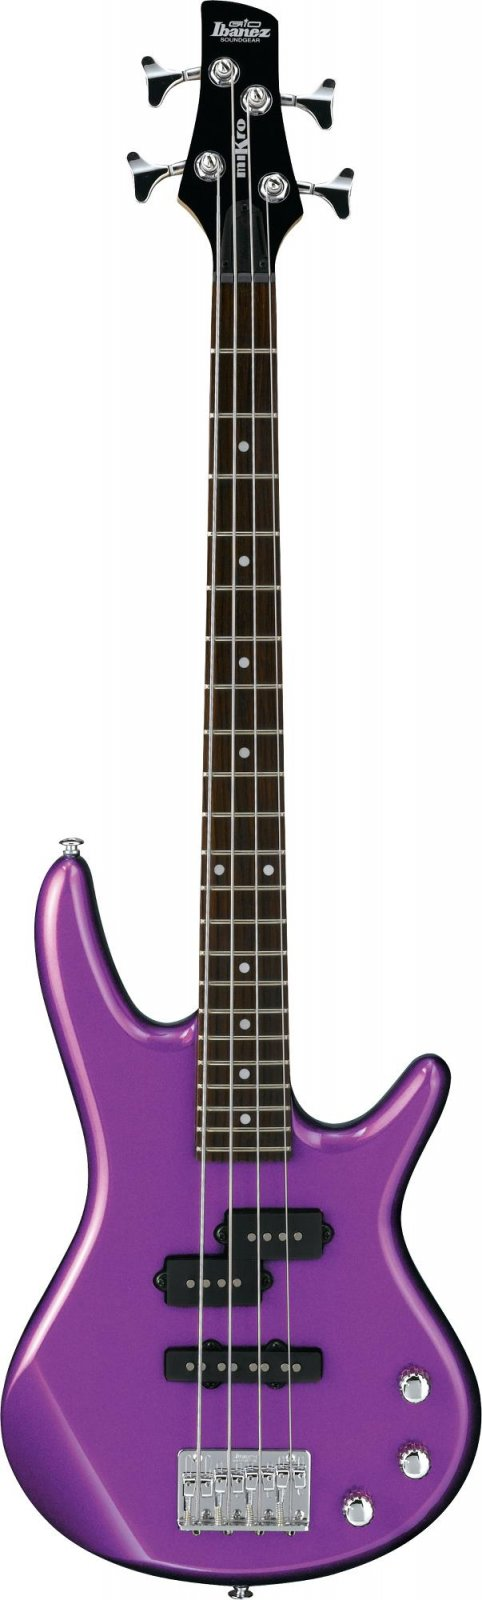 Ibanez GSRM20MPL Gio SR miKro Short Scale 4str Electric Bass - Metallic Purple